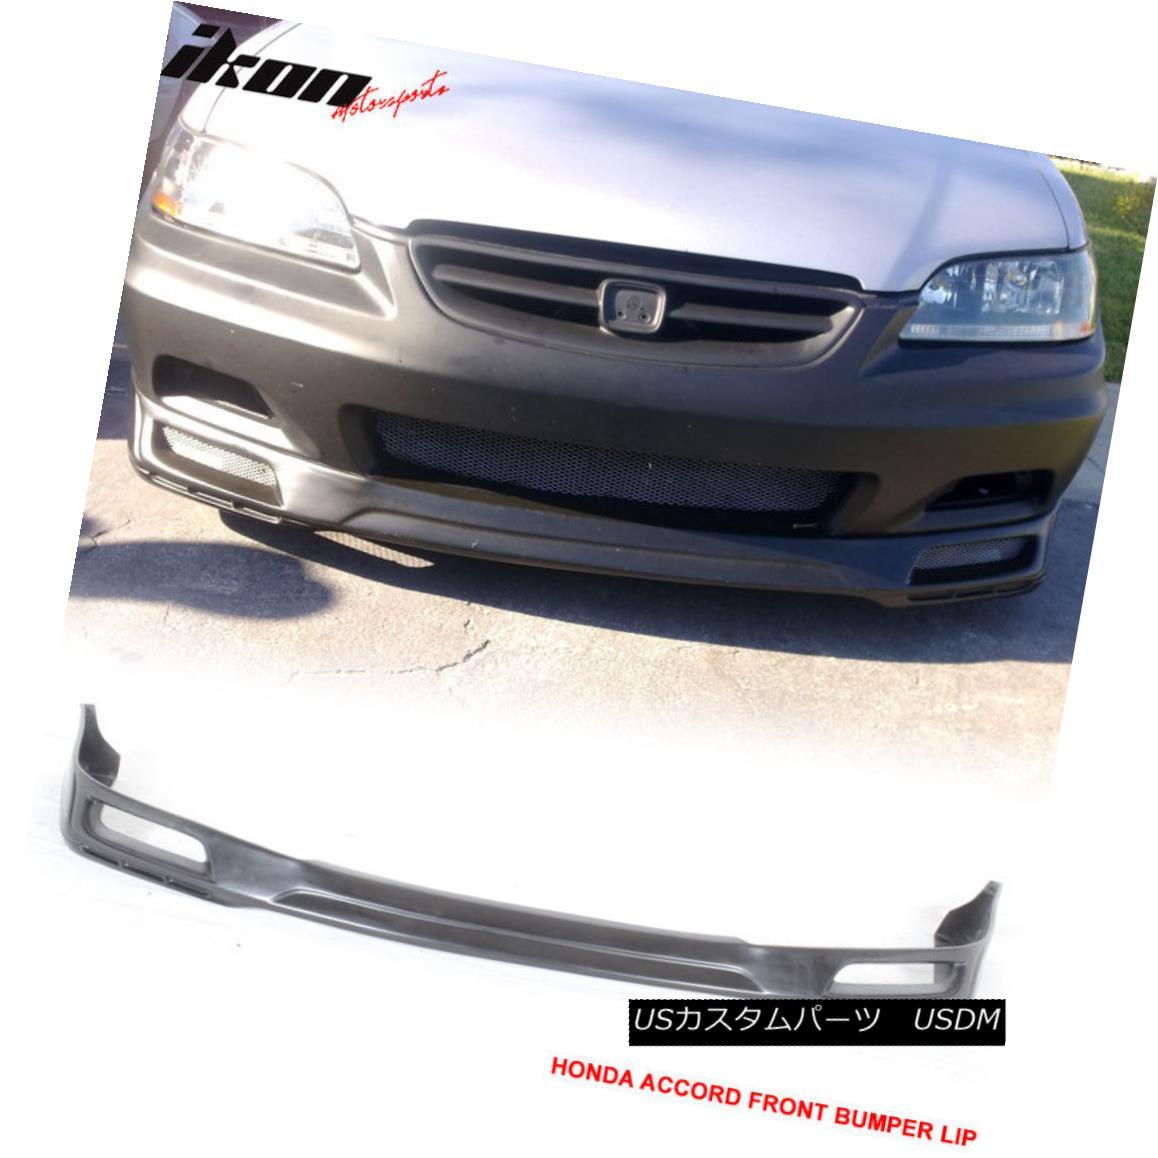 【50%OFF】 エアロパーツ PU Fits 98-02 Honda Accord Coupe 2Dr Front Bumper Lip Spoiler Black PU Fits 98-02ホンダアコードクーペ2Drフロントバンパーリップスポイラーブラック, 角田市 50e99a71